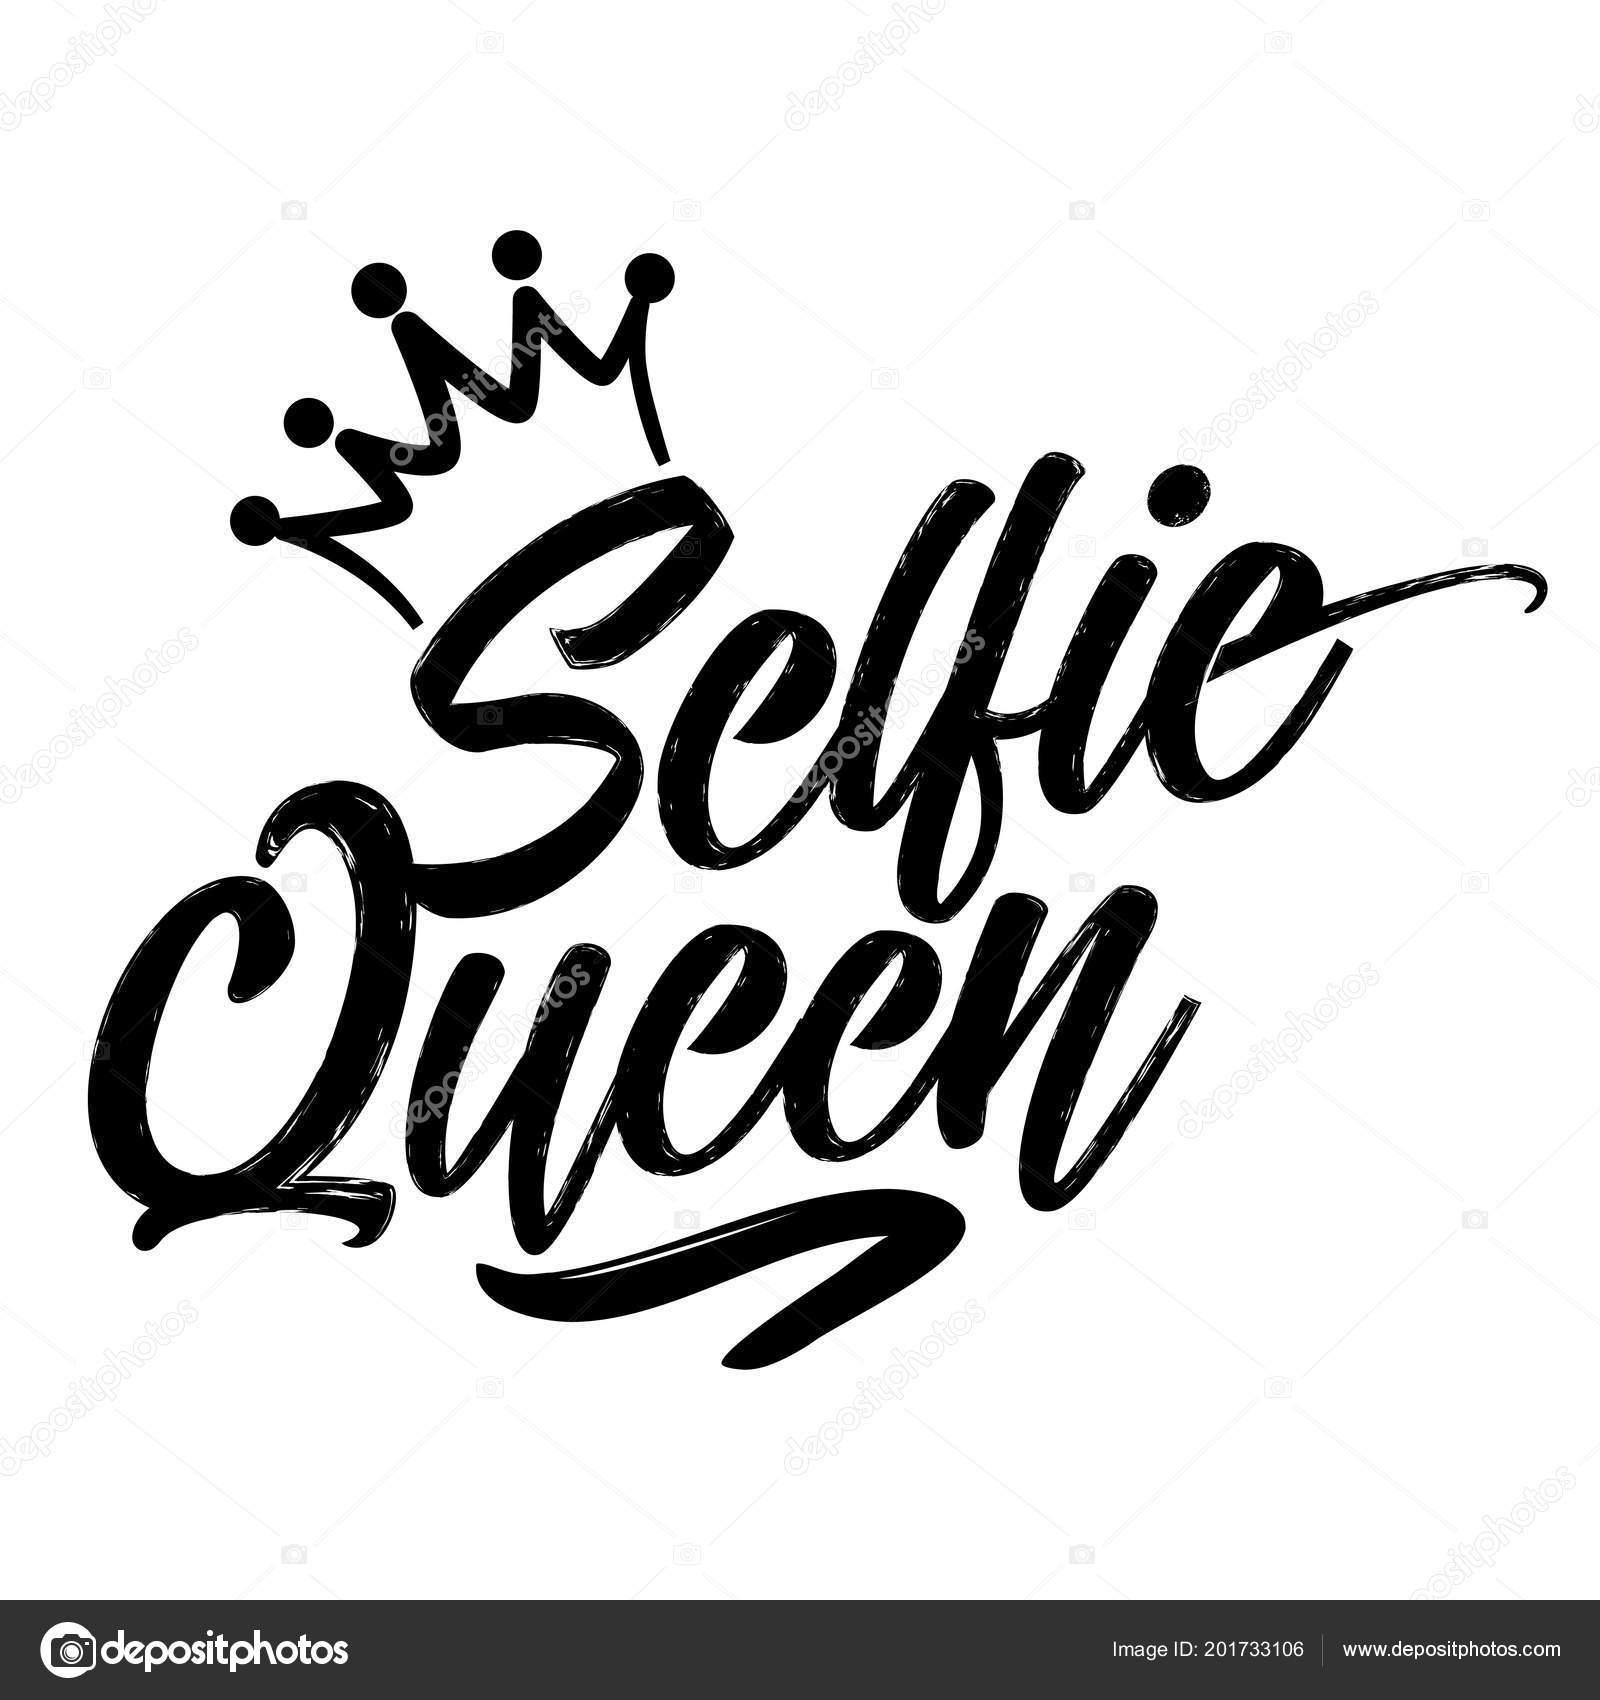 Selfie Queen Hand Drawn Typography Poster Conceptual